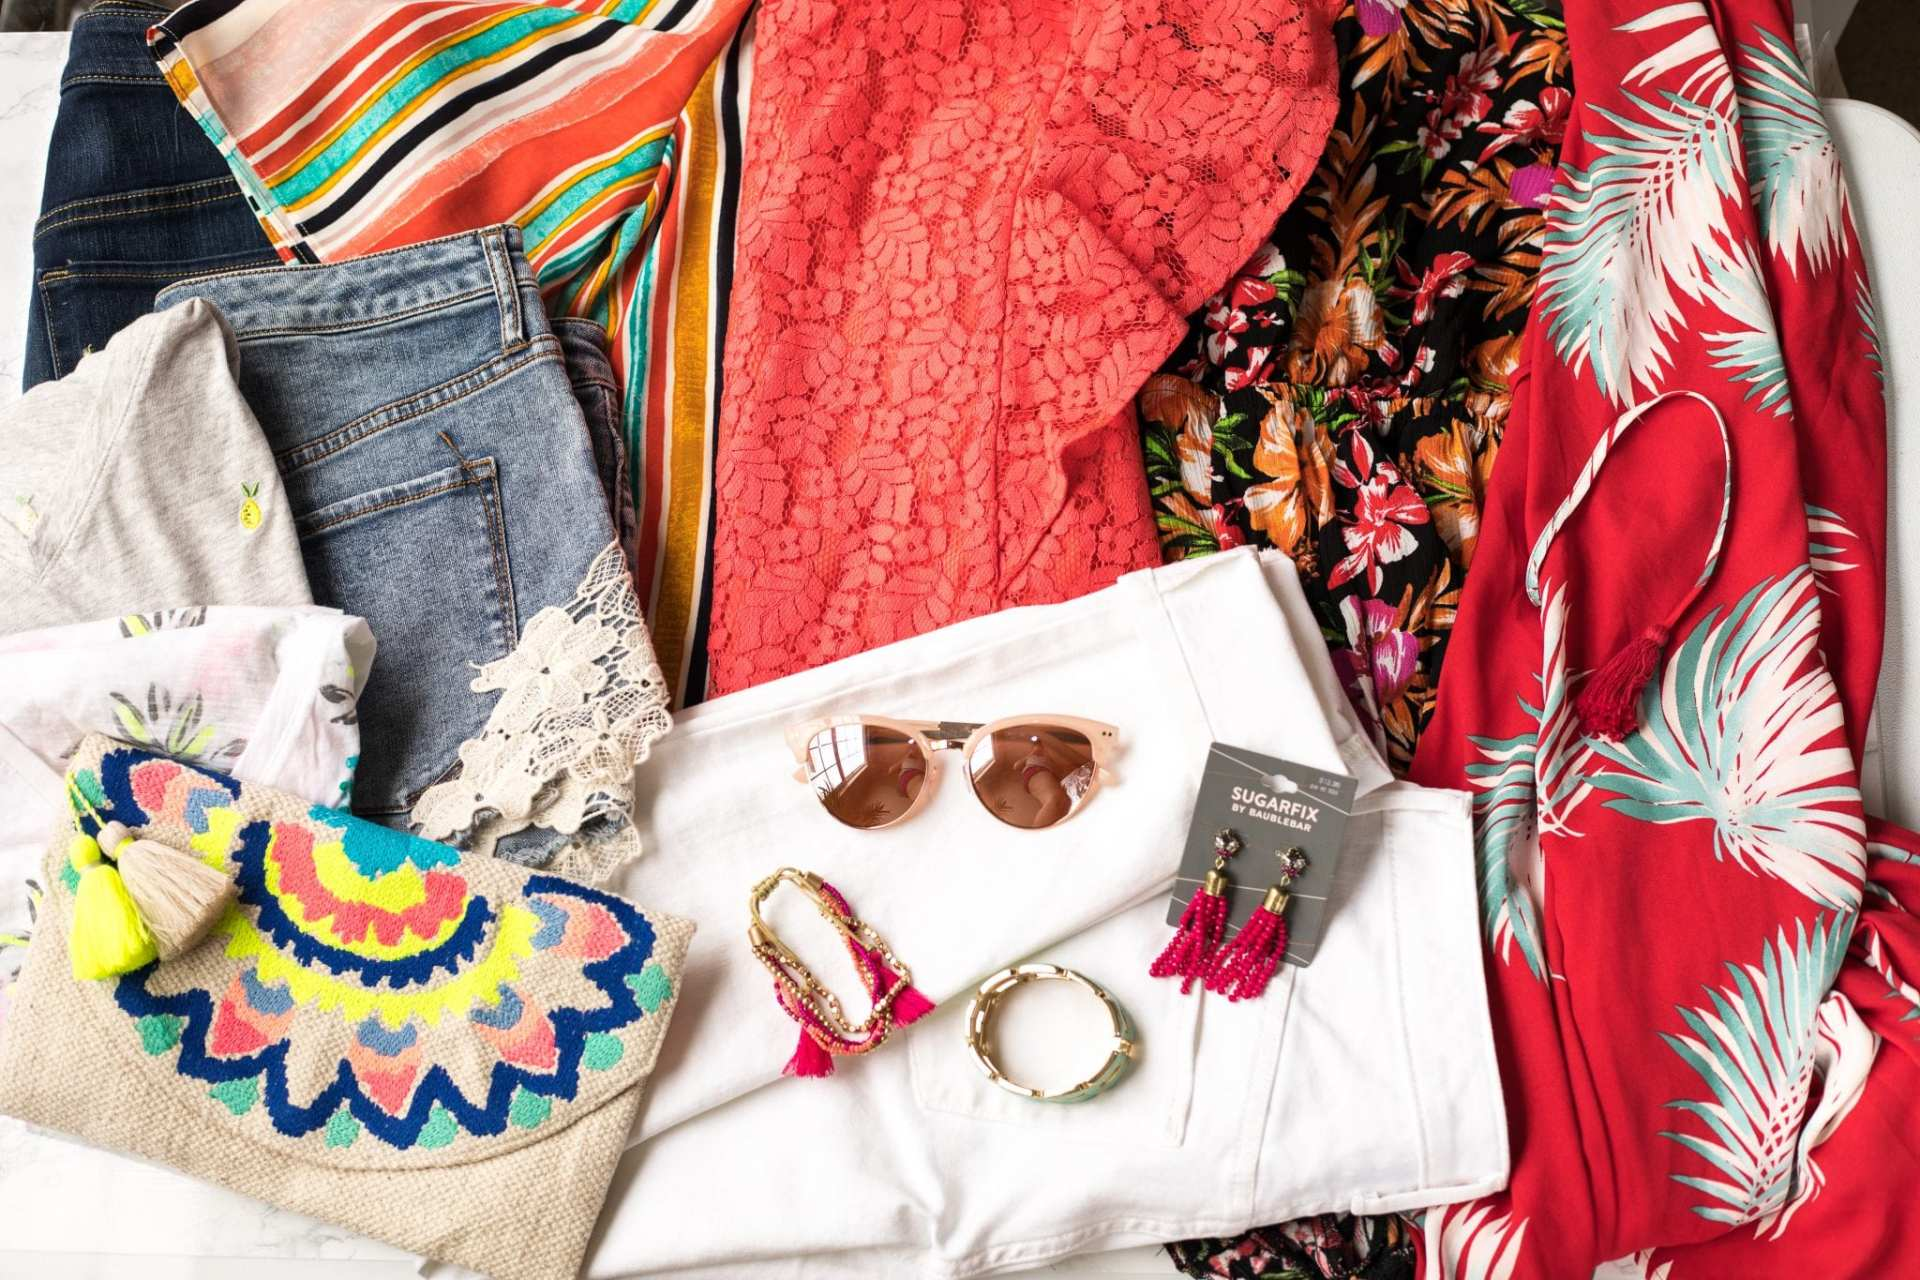 Honeymoon Packing List Beach vacation to Oahu Hawaii | Cara Newhart - Never Skip Brunch Blog